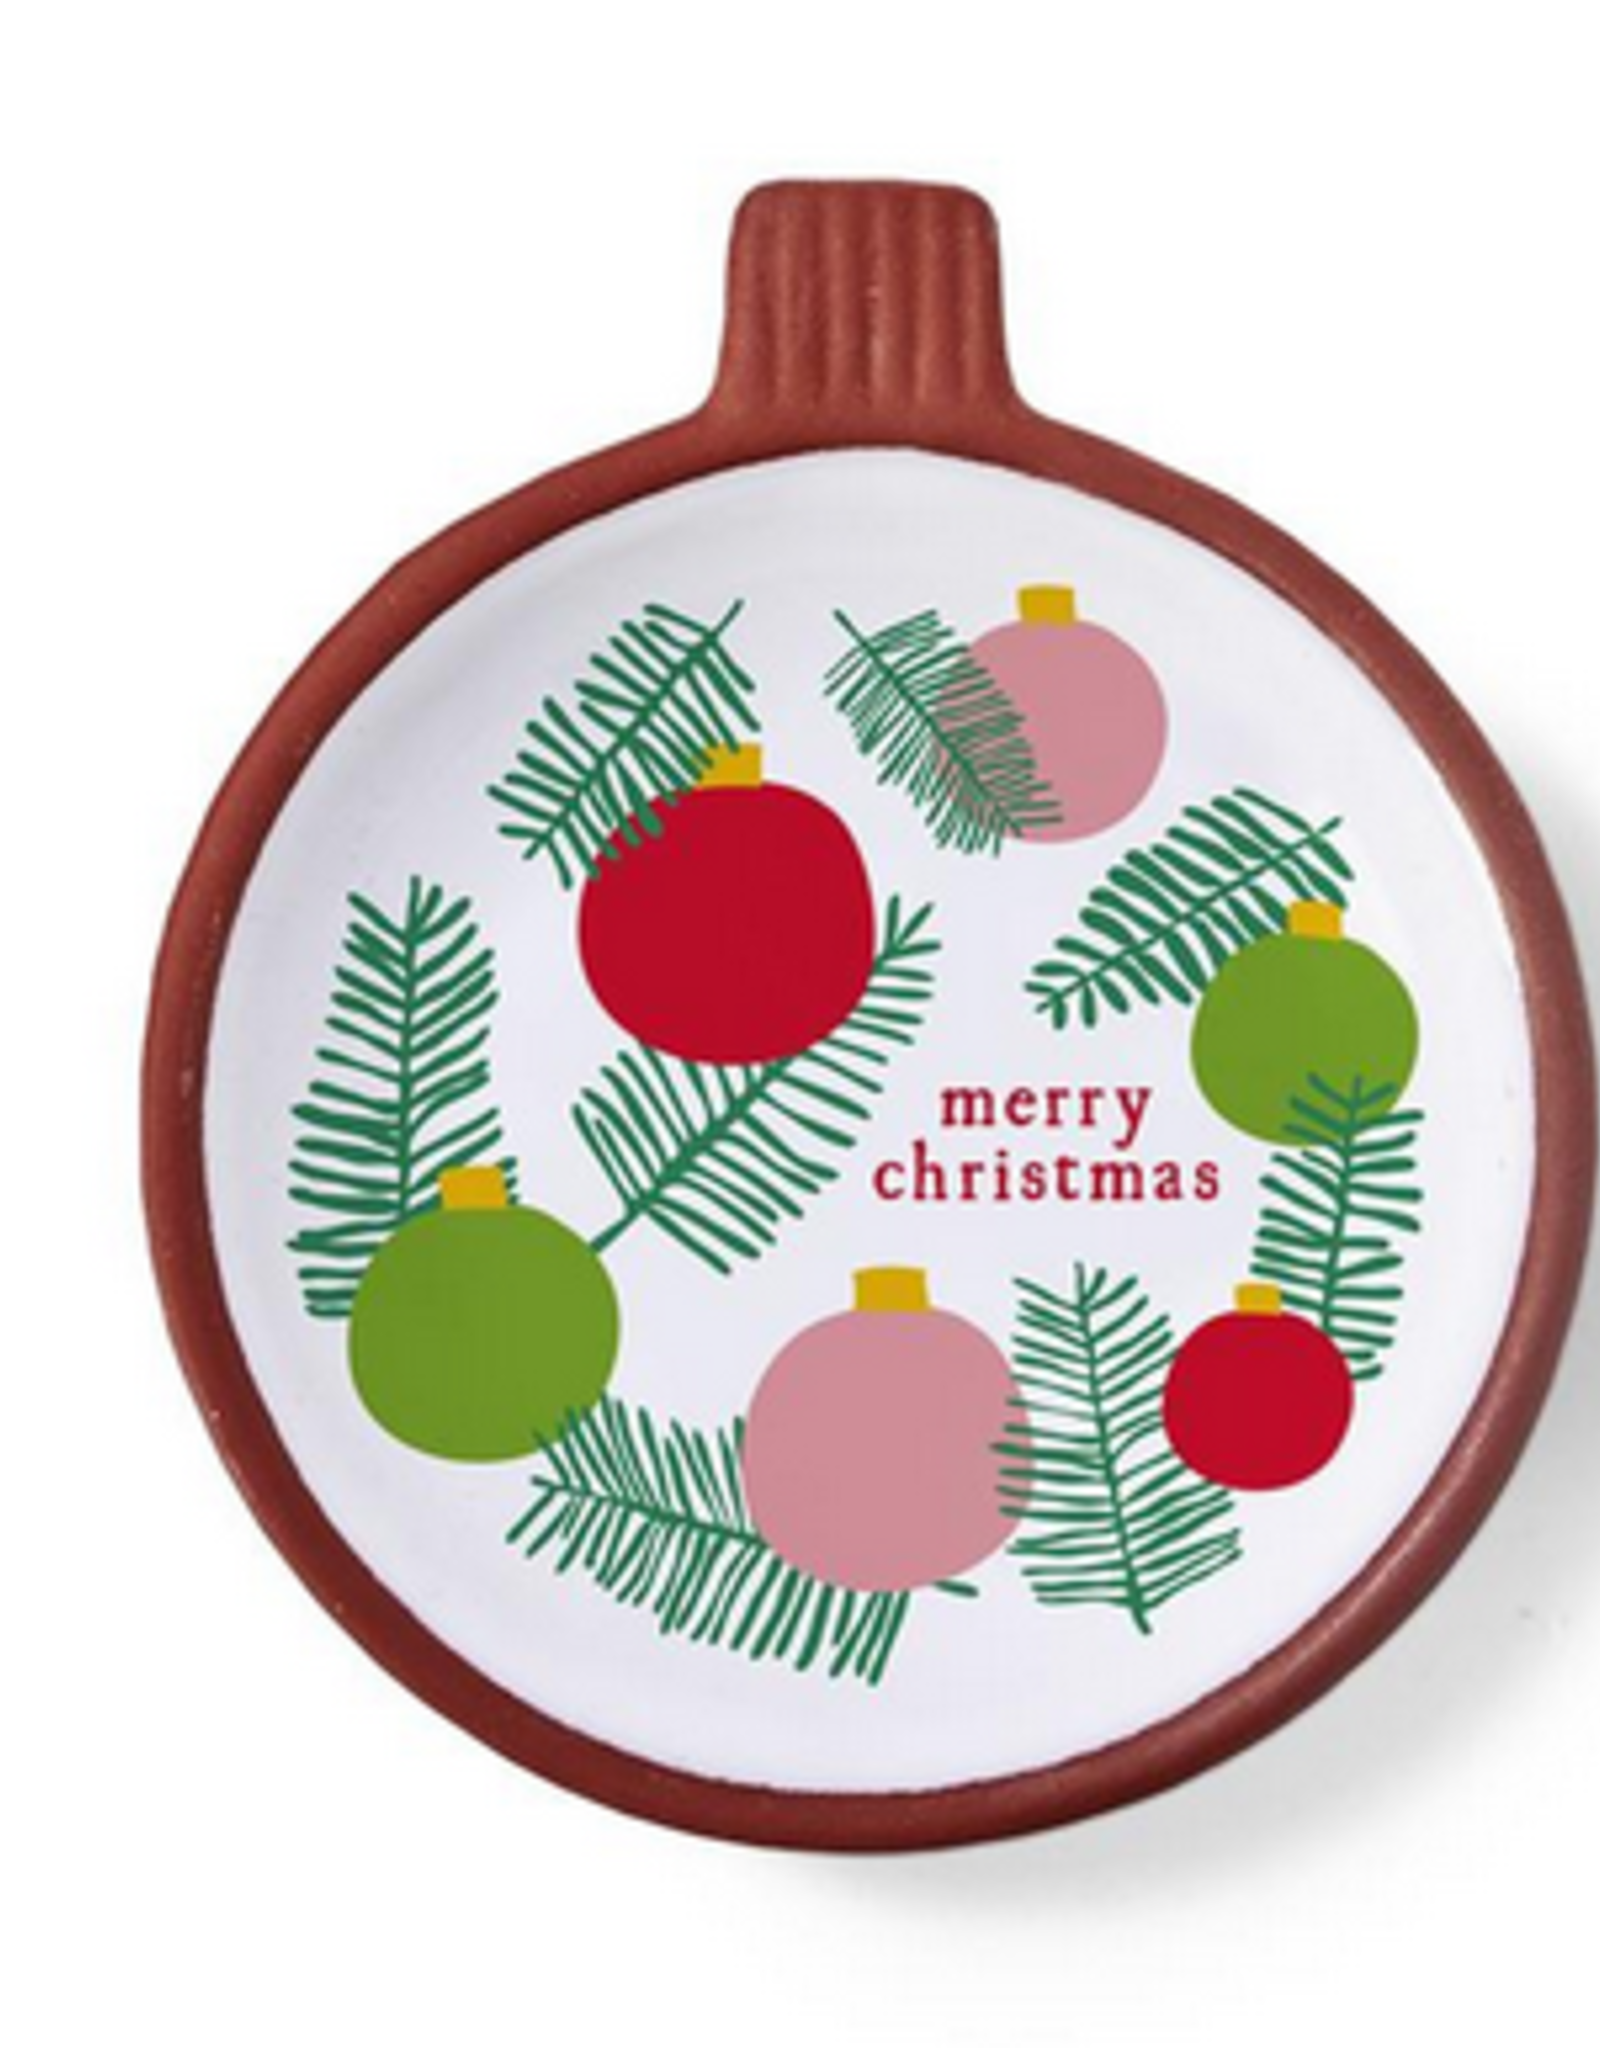 HOLIDAY TRINKET BOWLS BULB MERRY CHRISTMAS